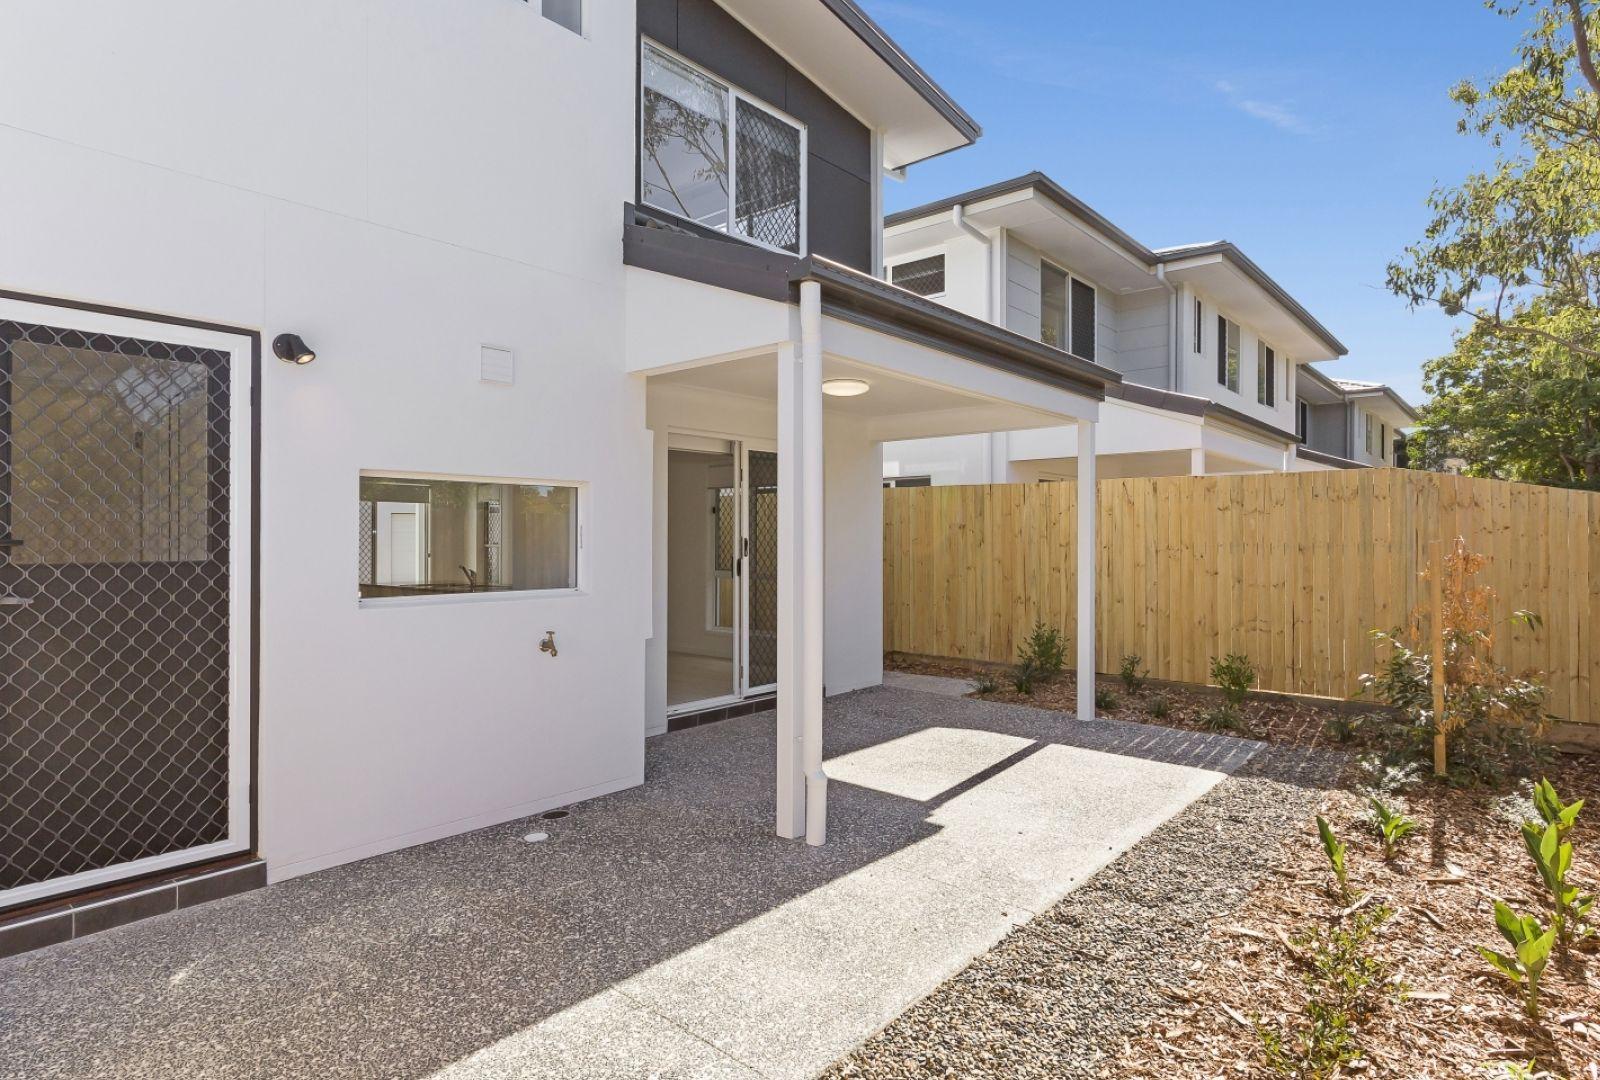 1 / 79 Cartwright Street, Taigum QLD 4018, Image 11